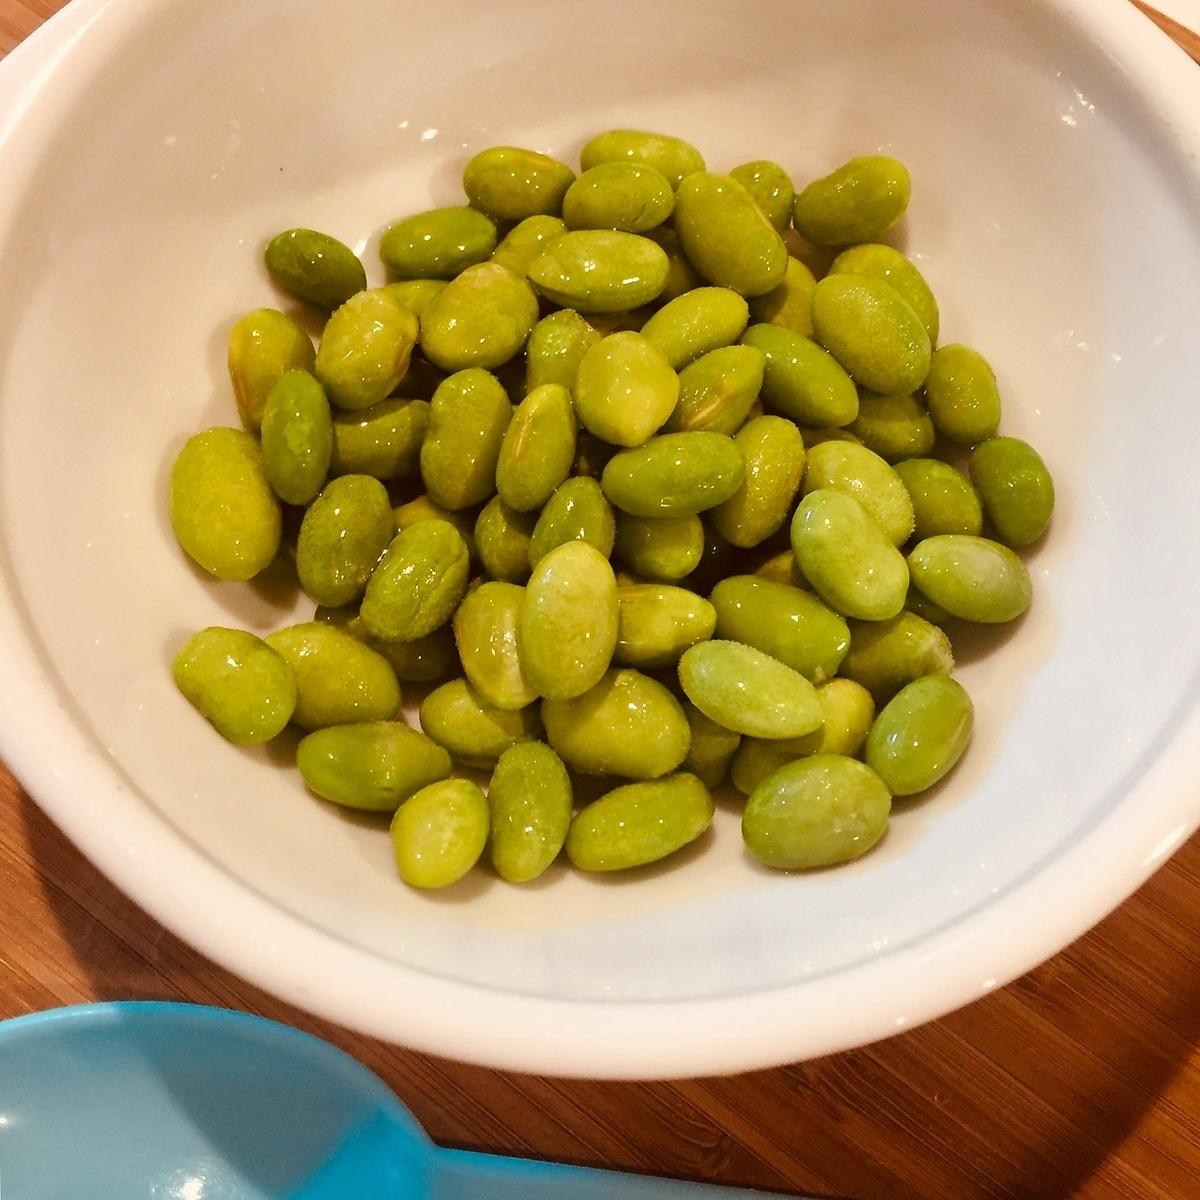 Peeled soybeans